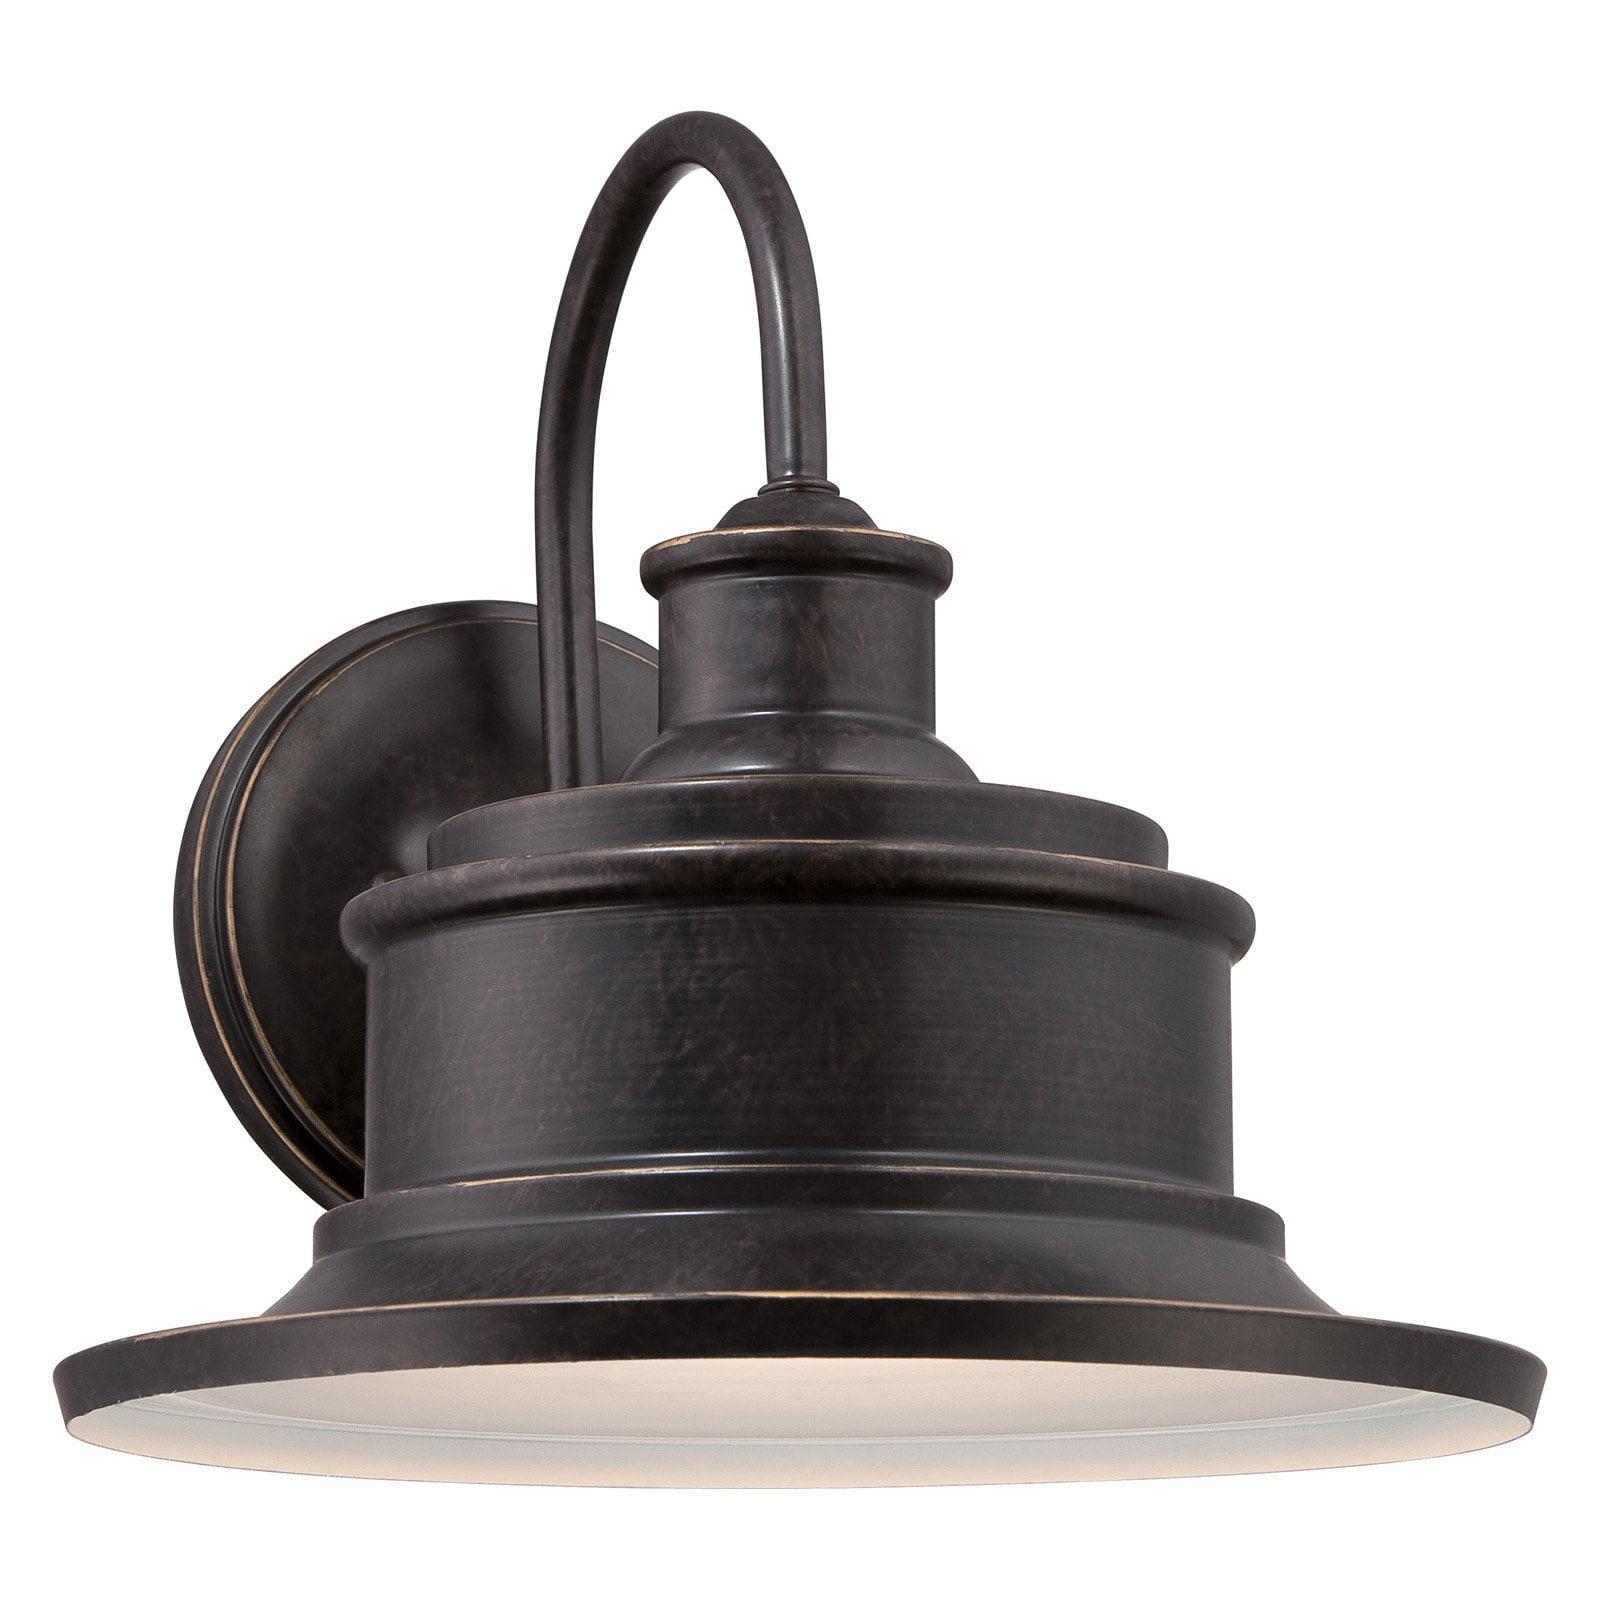 Quoizel Seaford SFD8409 Outdoor Wall Lantern